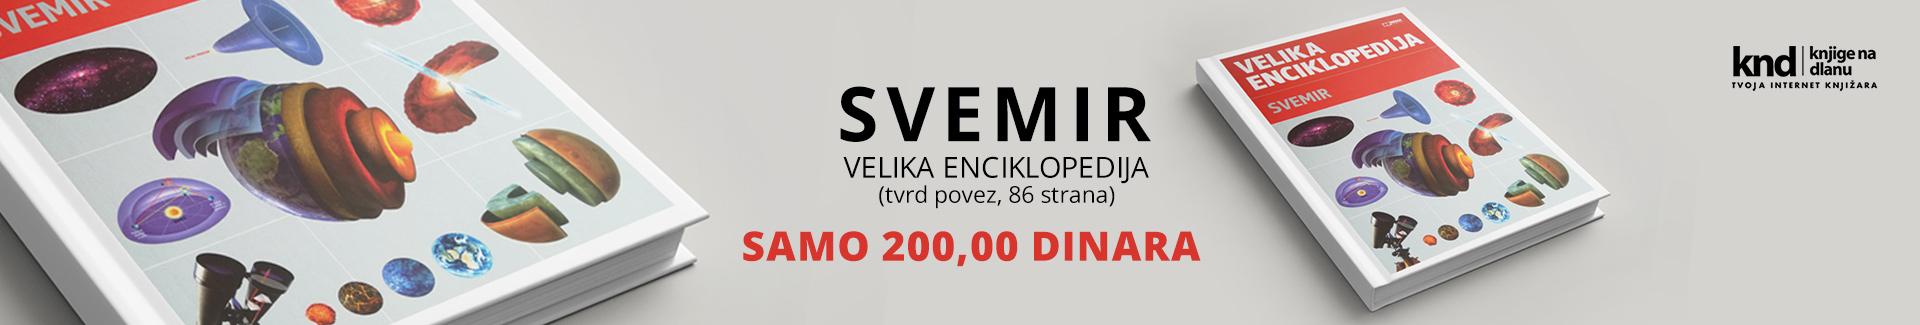 Enciklopedija SVEMIR